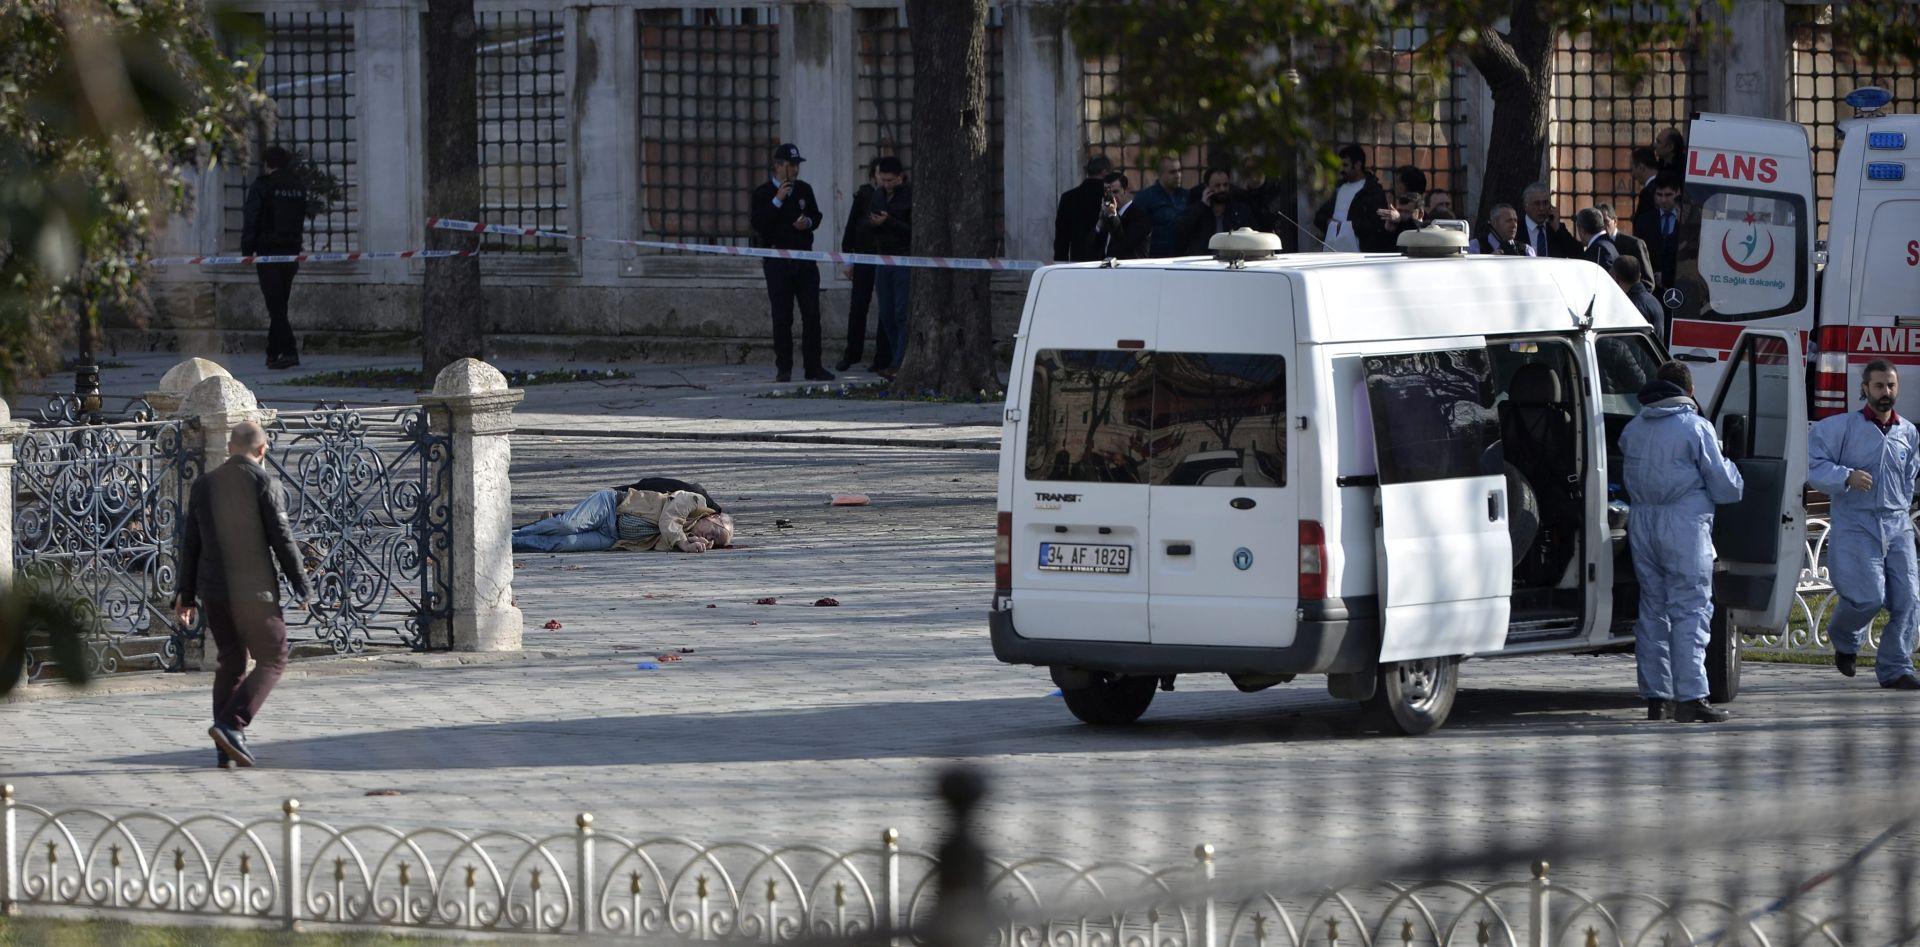 TURSKA VLADA: Islamska država je odgovorna za napad u Istanbulu